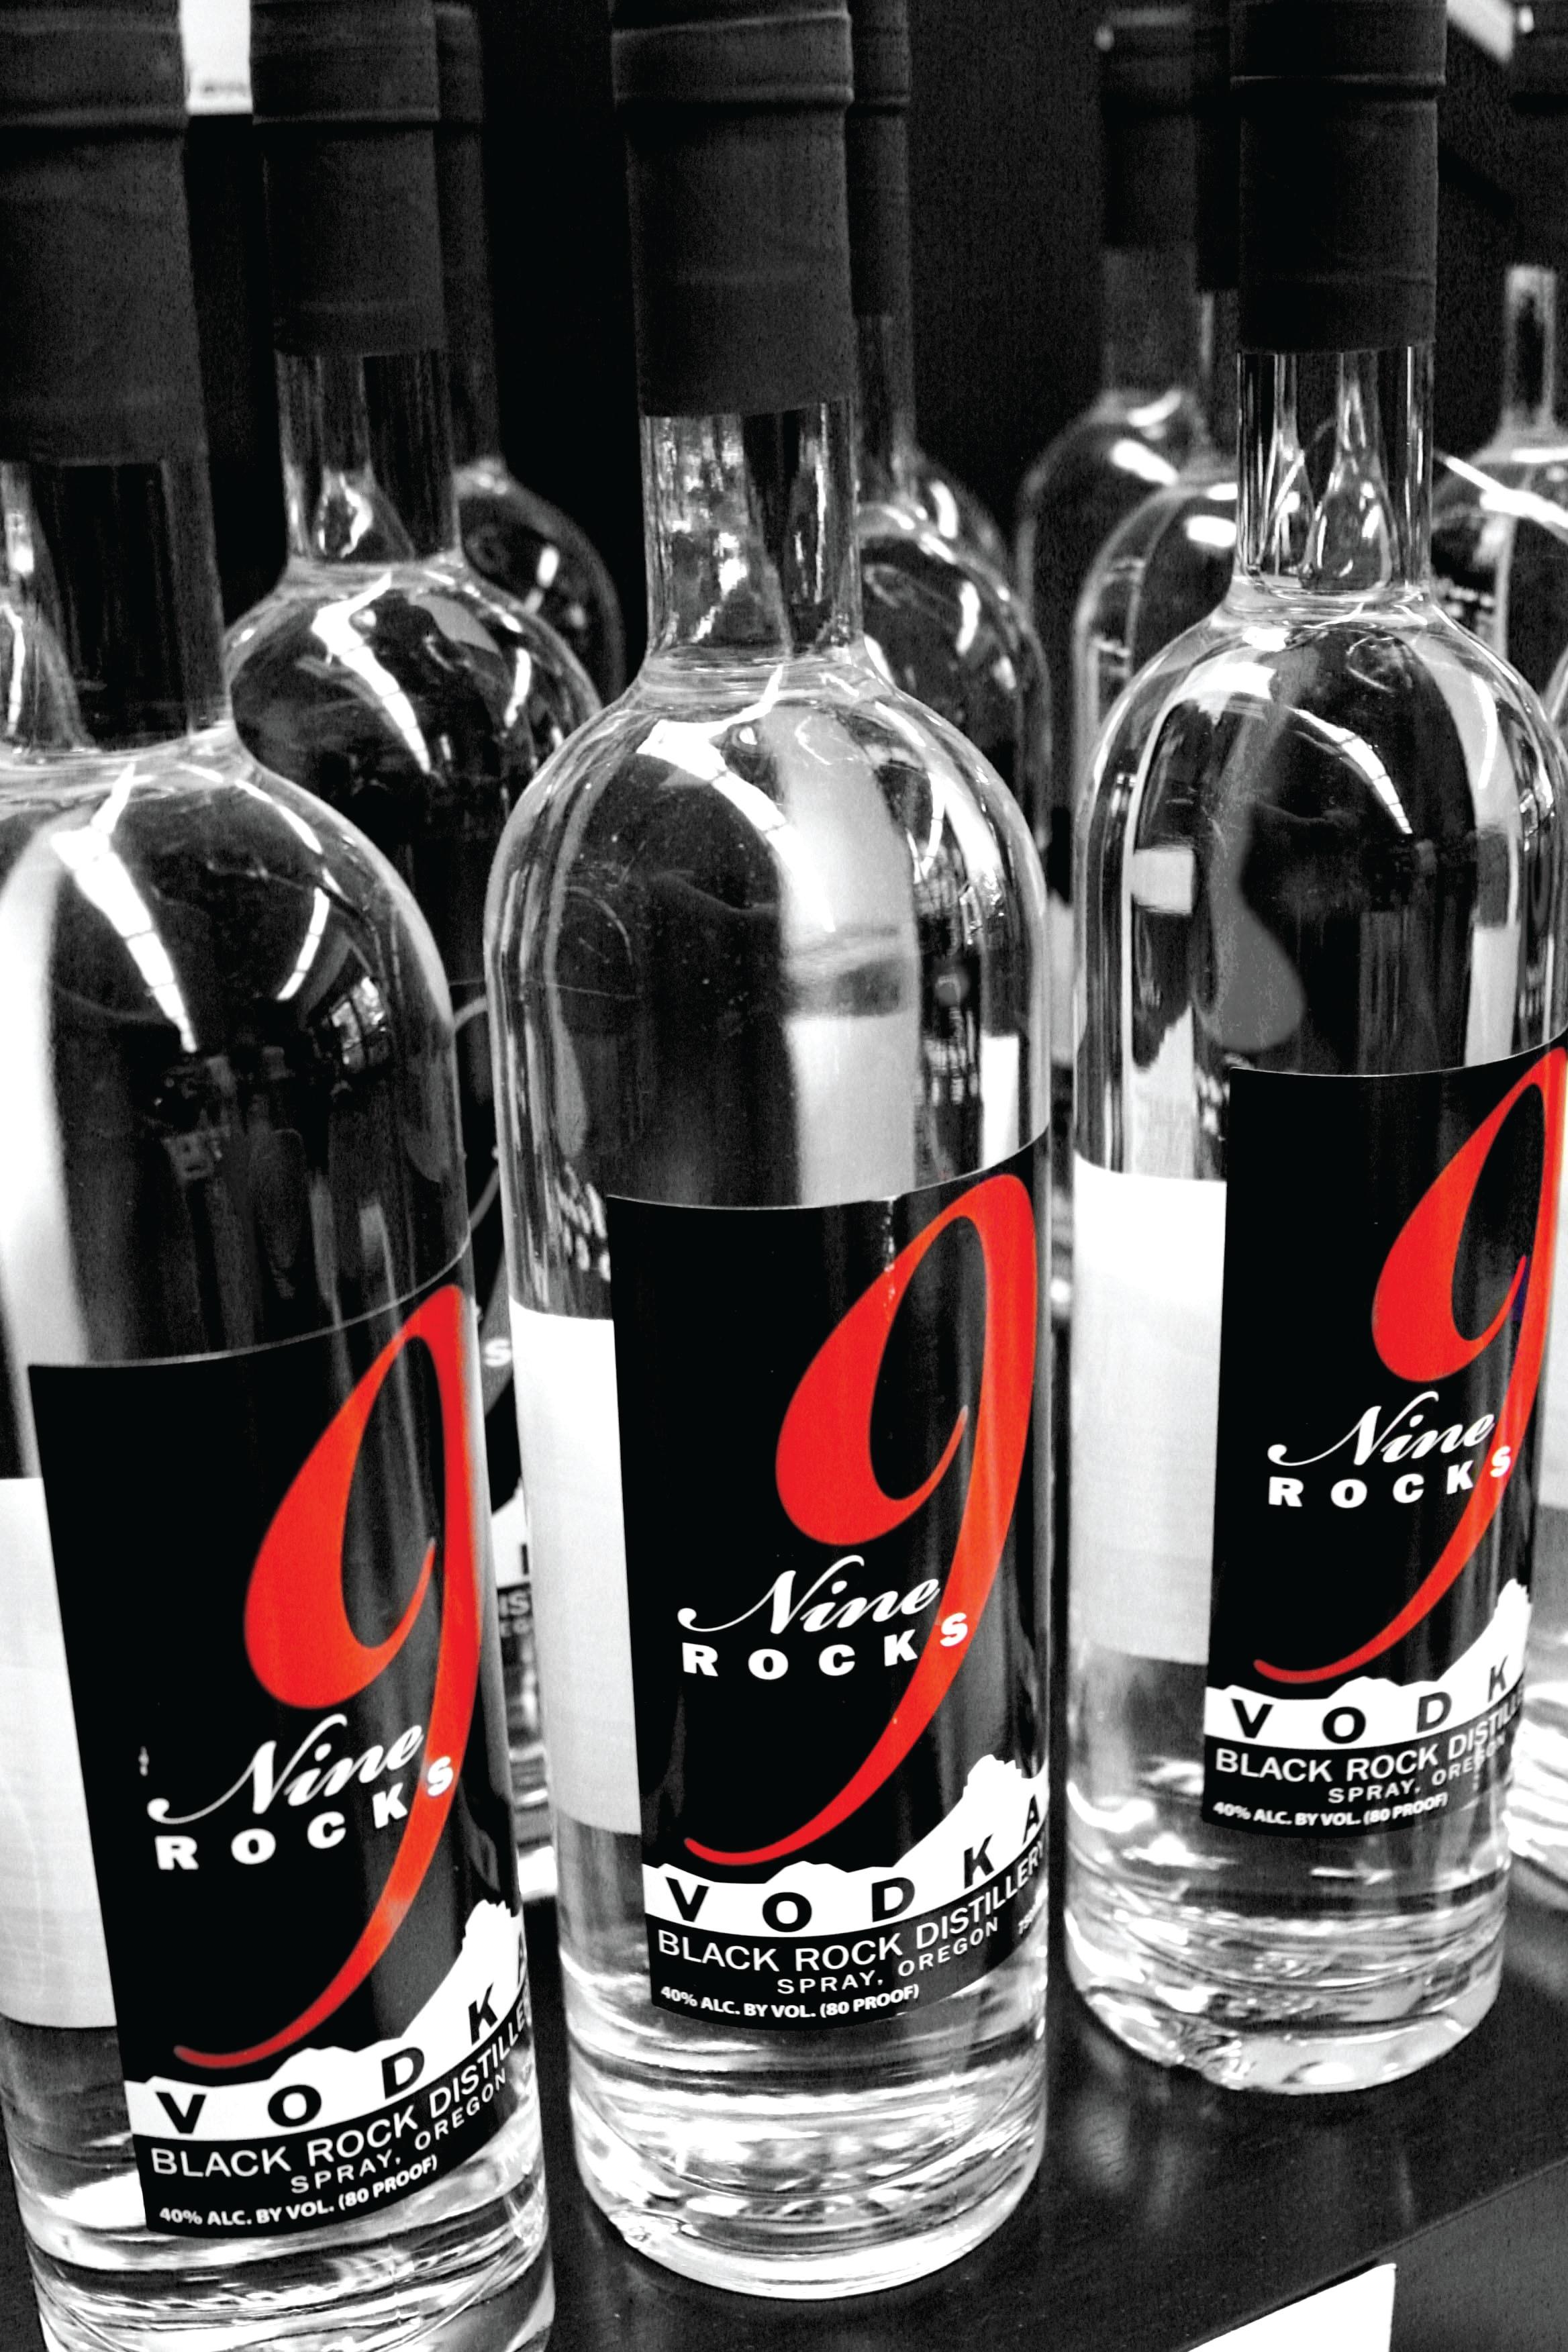 9 Rocks Vodka